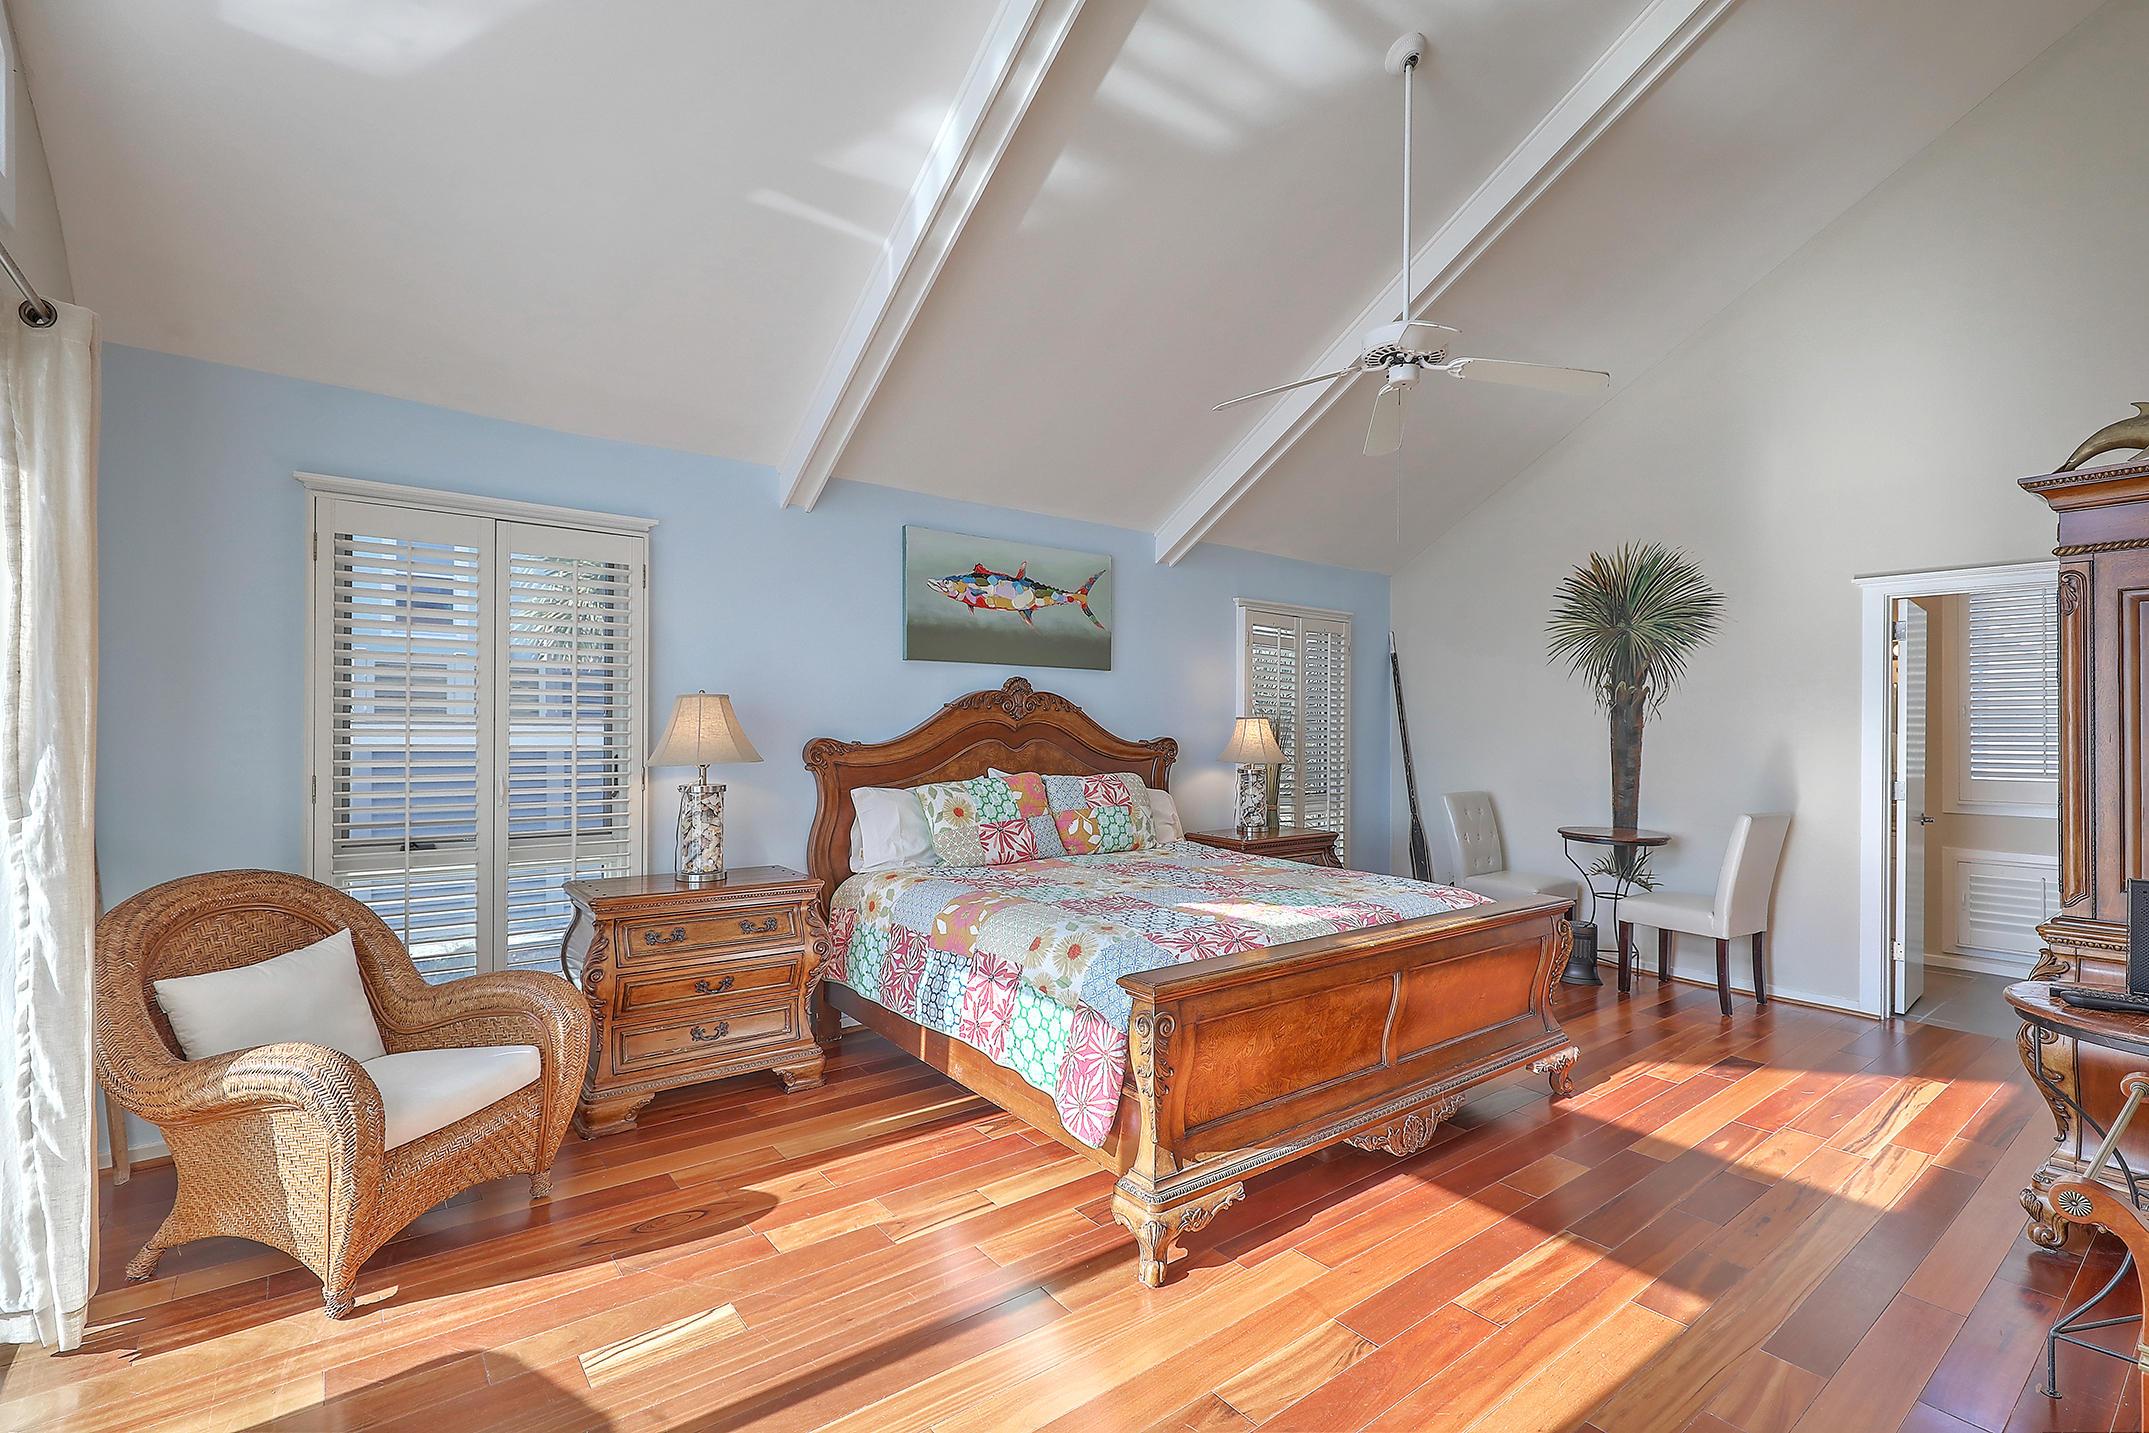 Wild Dunes Homes For Sale - 14 Beachwood East, Isle of Palms, SC - 25